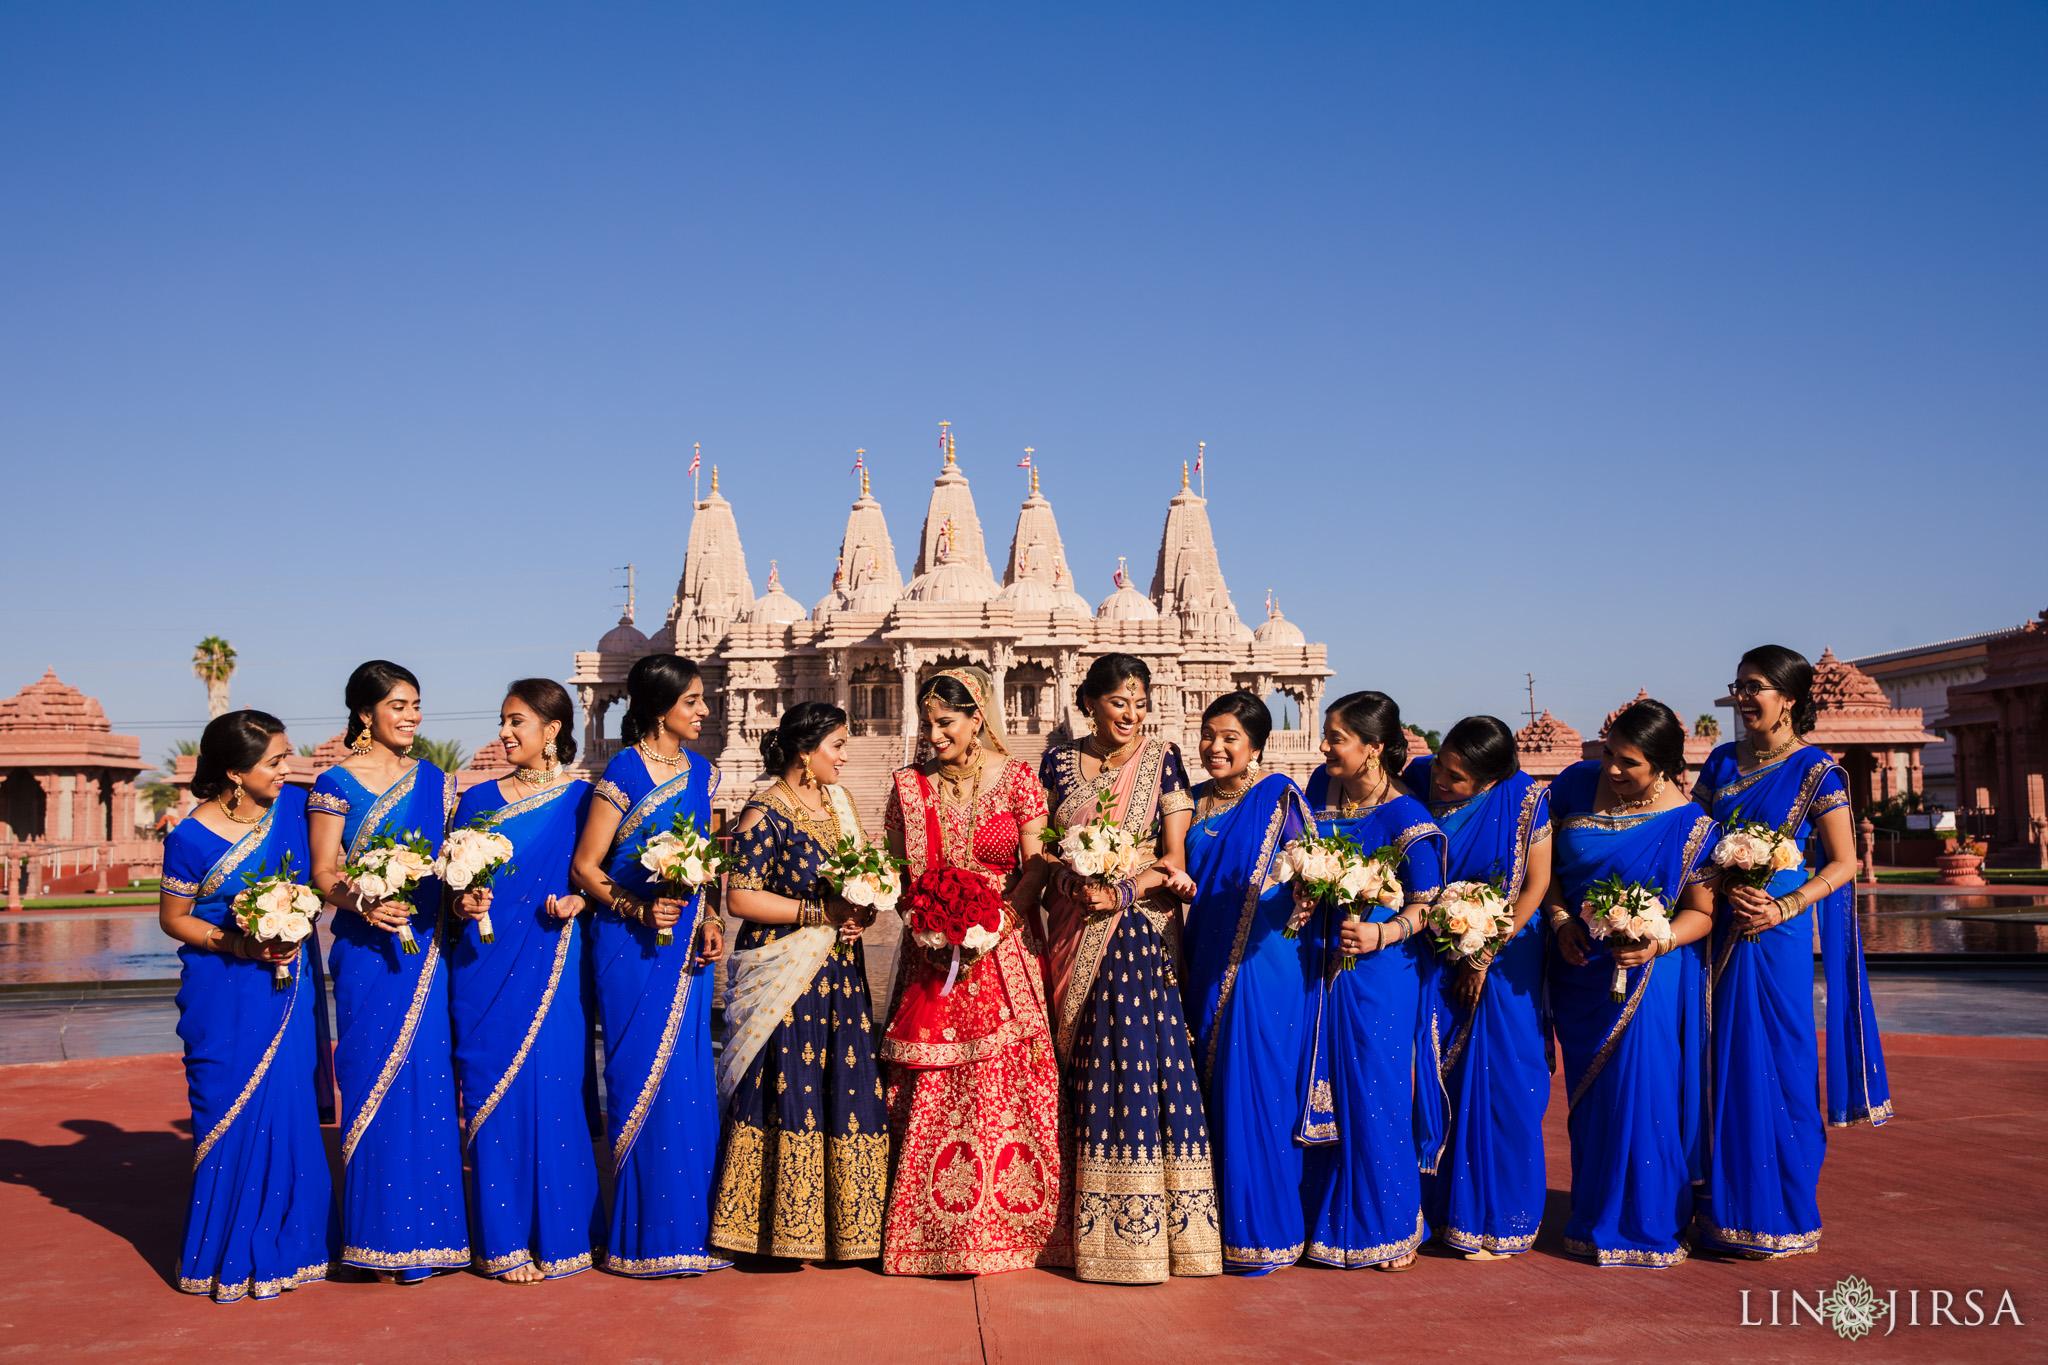 067 BAPS Swaminarayan Sanstha Chino Hills Indian Wedding Photography